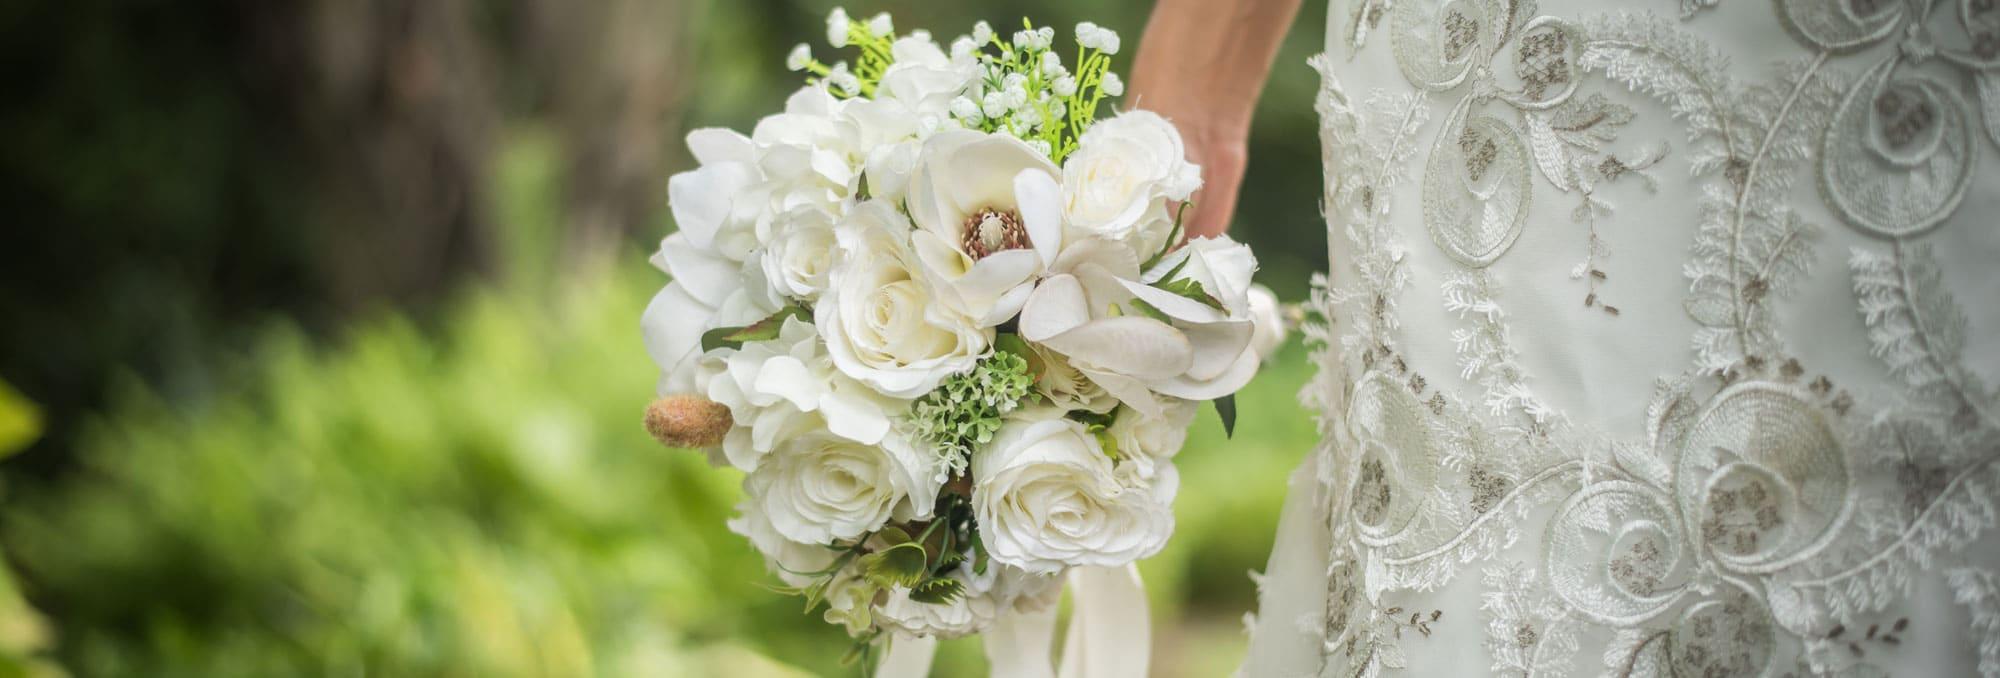 wedding flowers banner